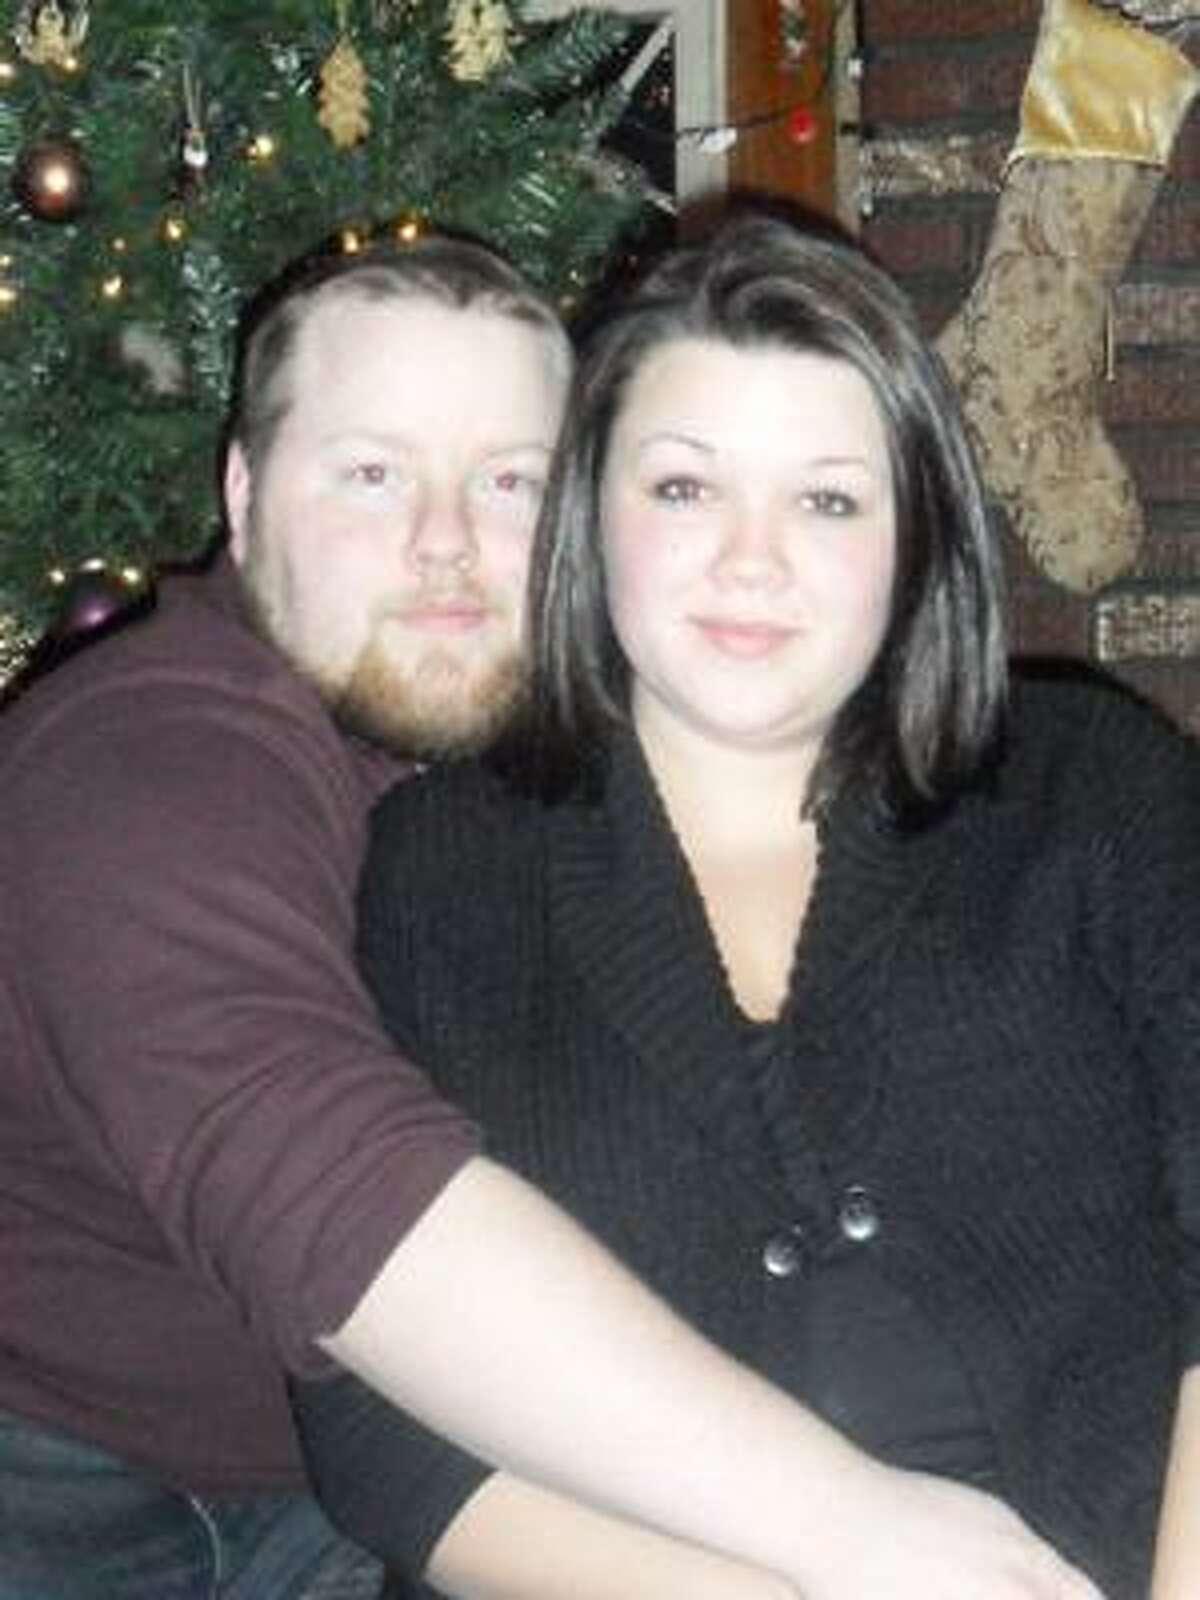 Chad E. Hill and Ashley C. Warren